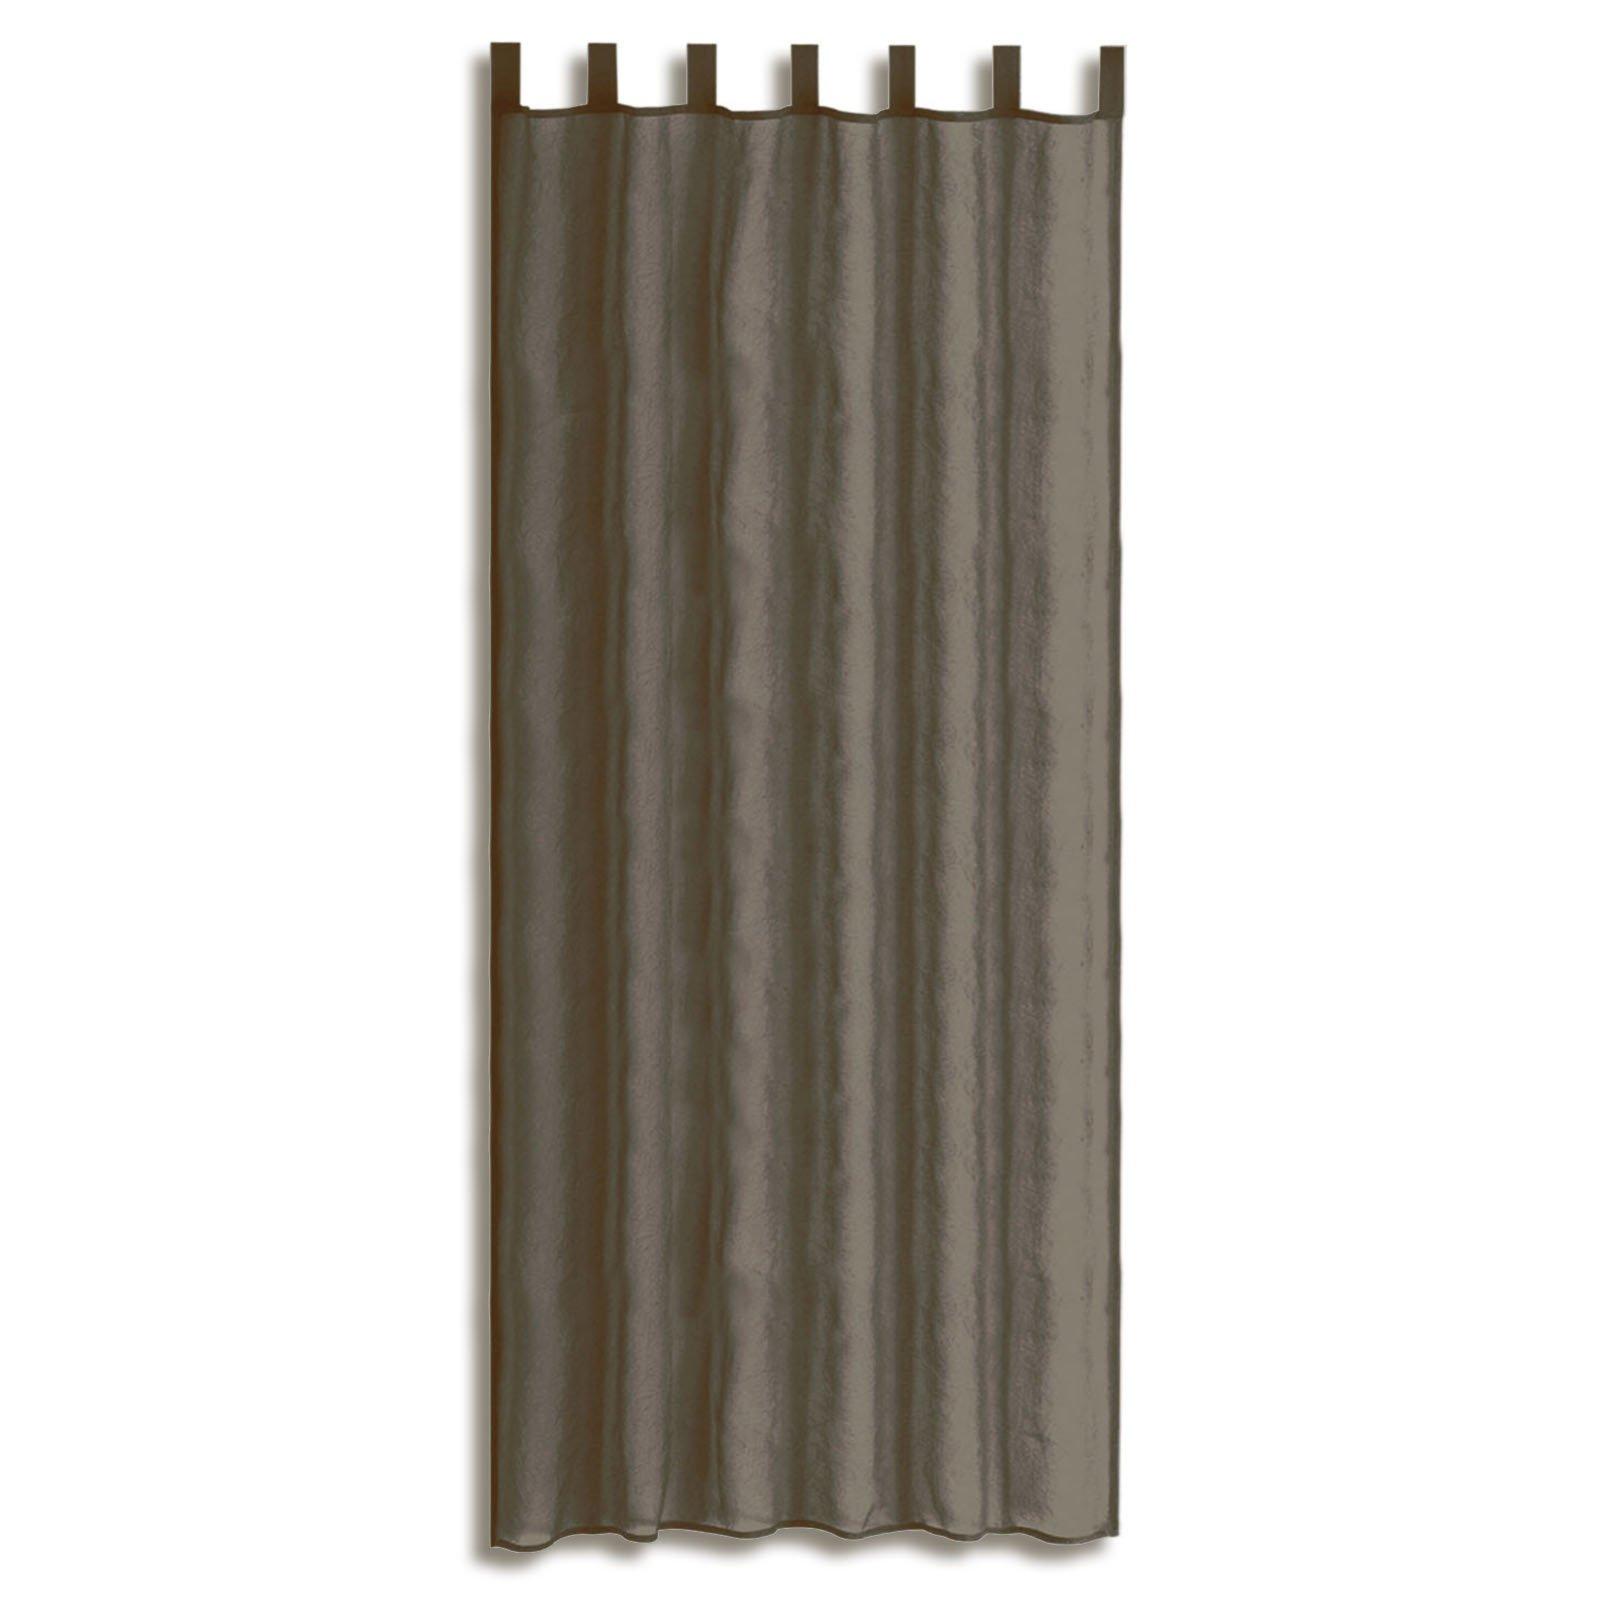 schlaufenschal granate taupe 135x235 cm transparente. Black Bedroom Furniture Sets. Home Design Ideas